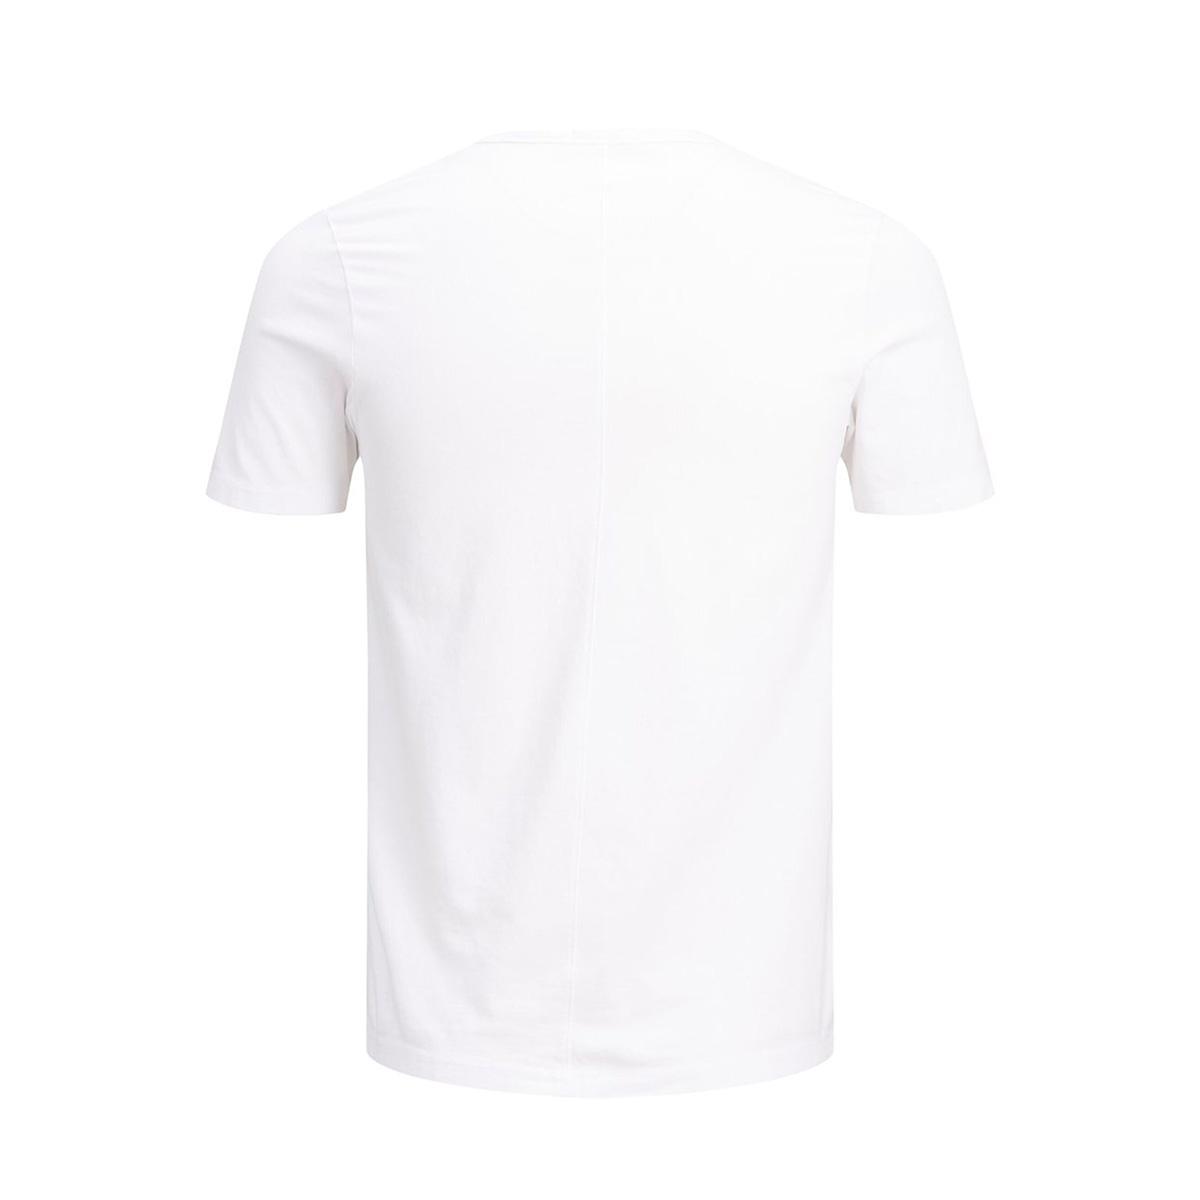 jprgray bla. tee ss crew neck 12159443 jack & jones t-shirt white/slim fit